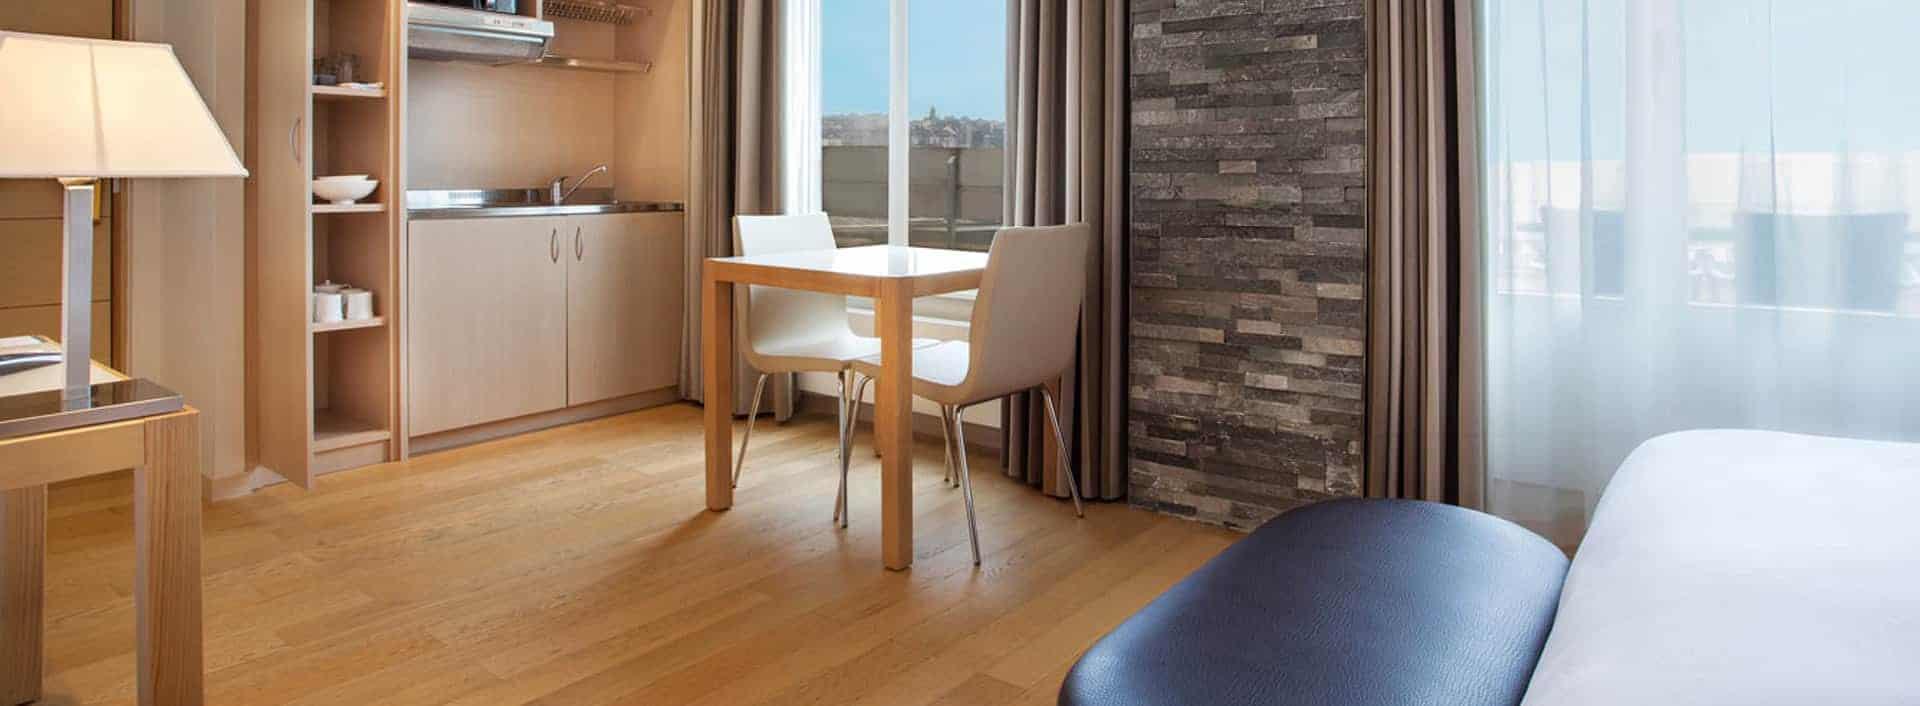 The Starling Residence Geneva Reservez votre chambre a l'hôtel Starling Residence au coeur de Geneve